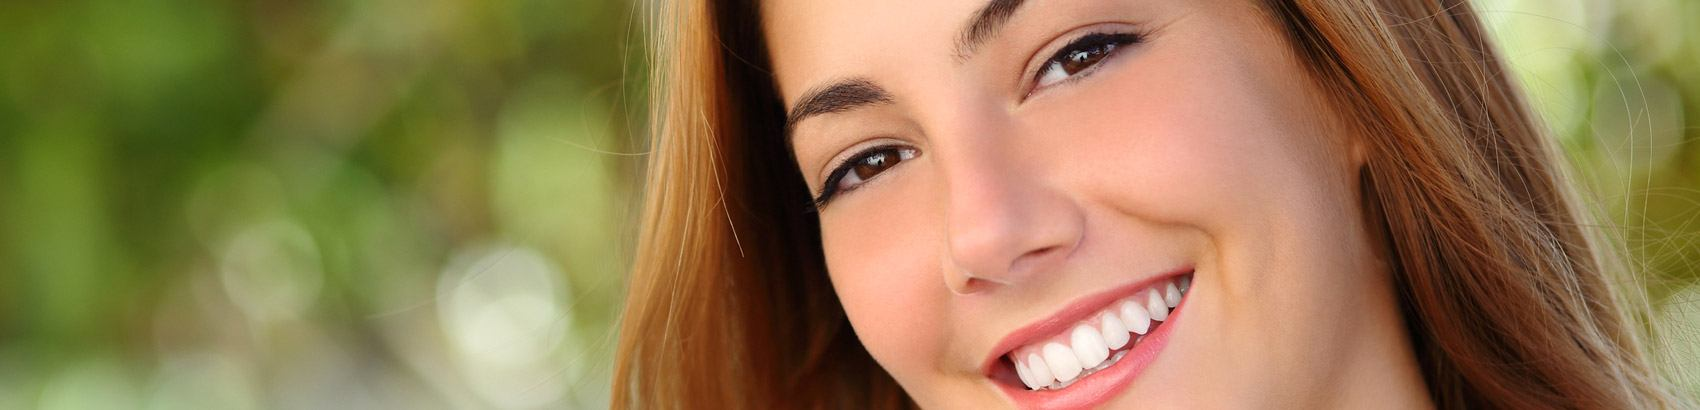 CEREC Same Day Crowns - Asuncion Dental Group